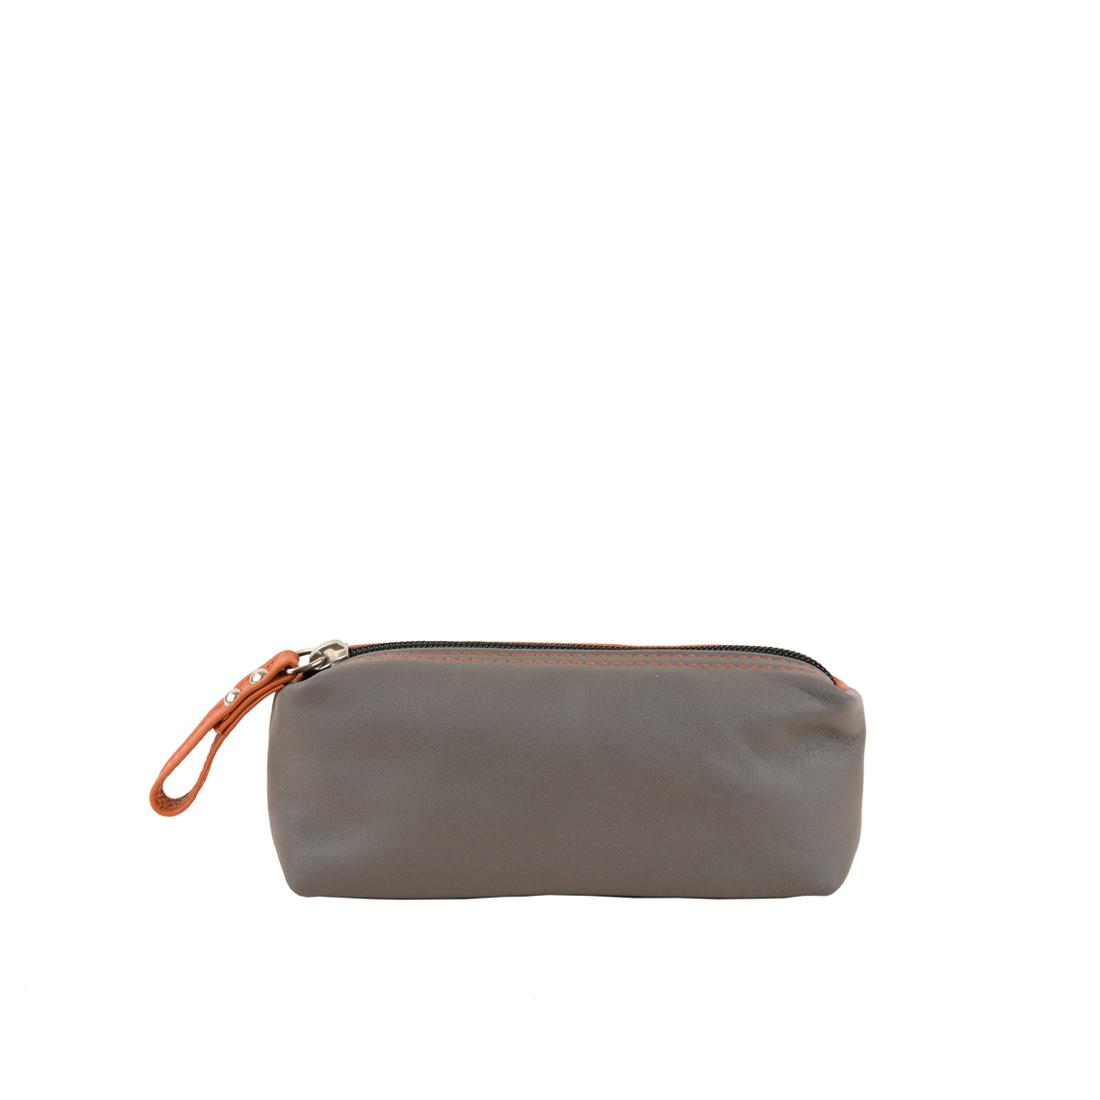 Make Up Bag in Orange / Grigio